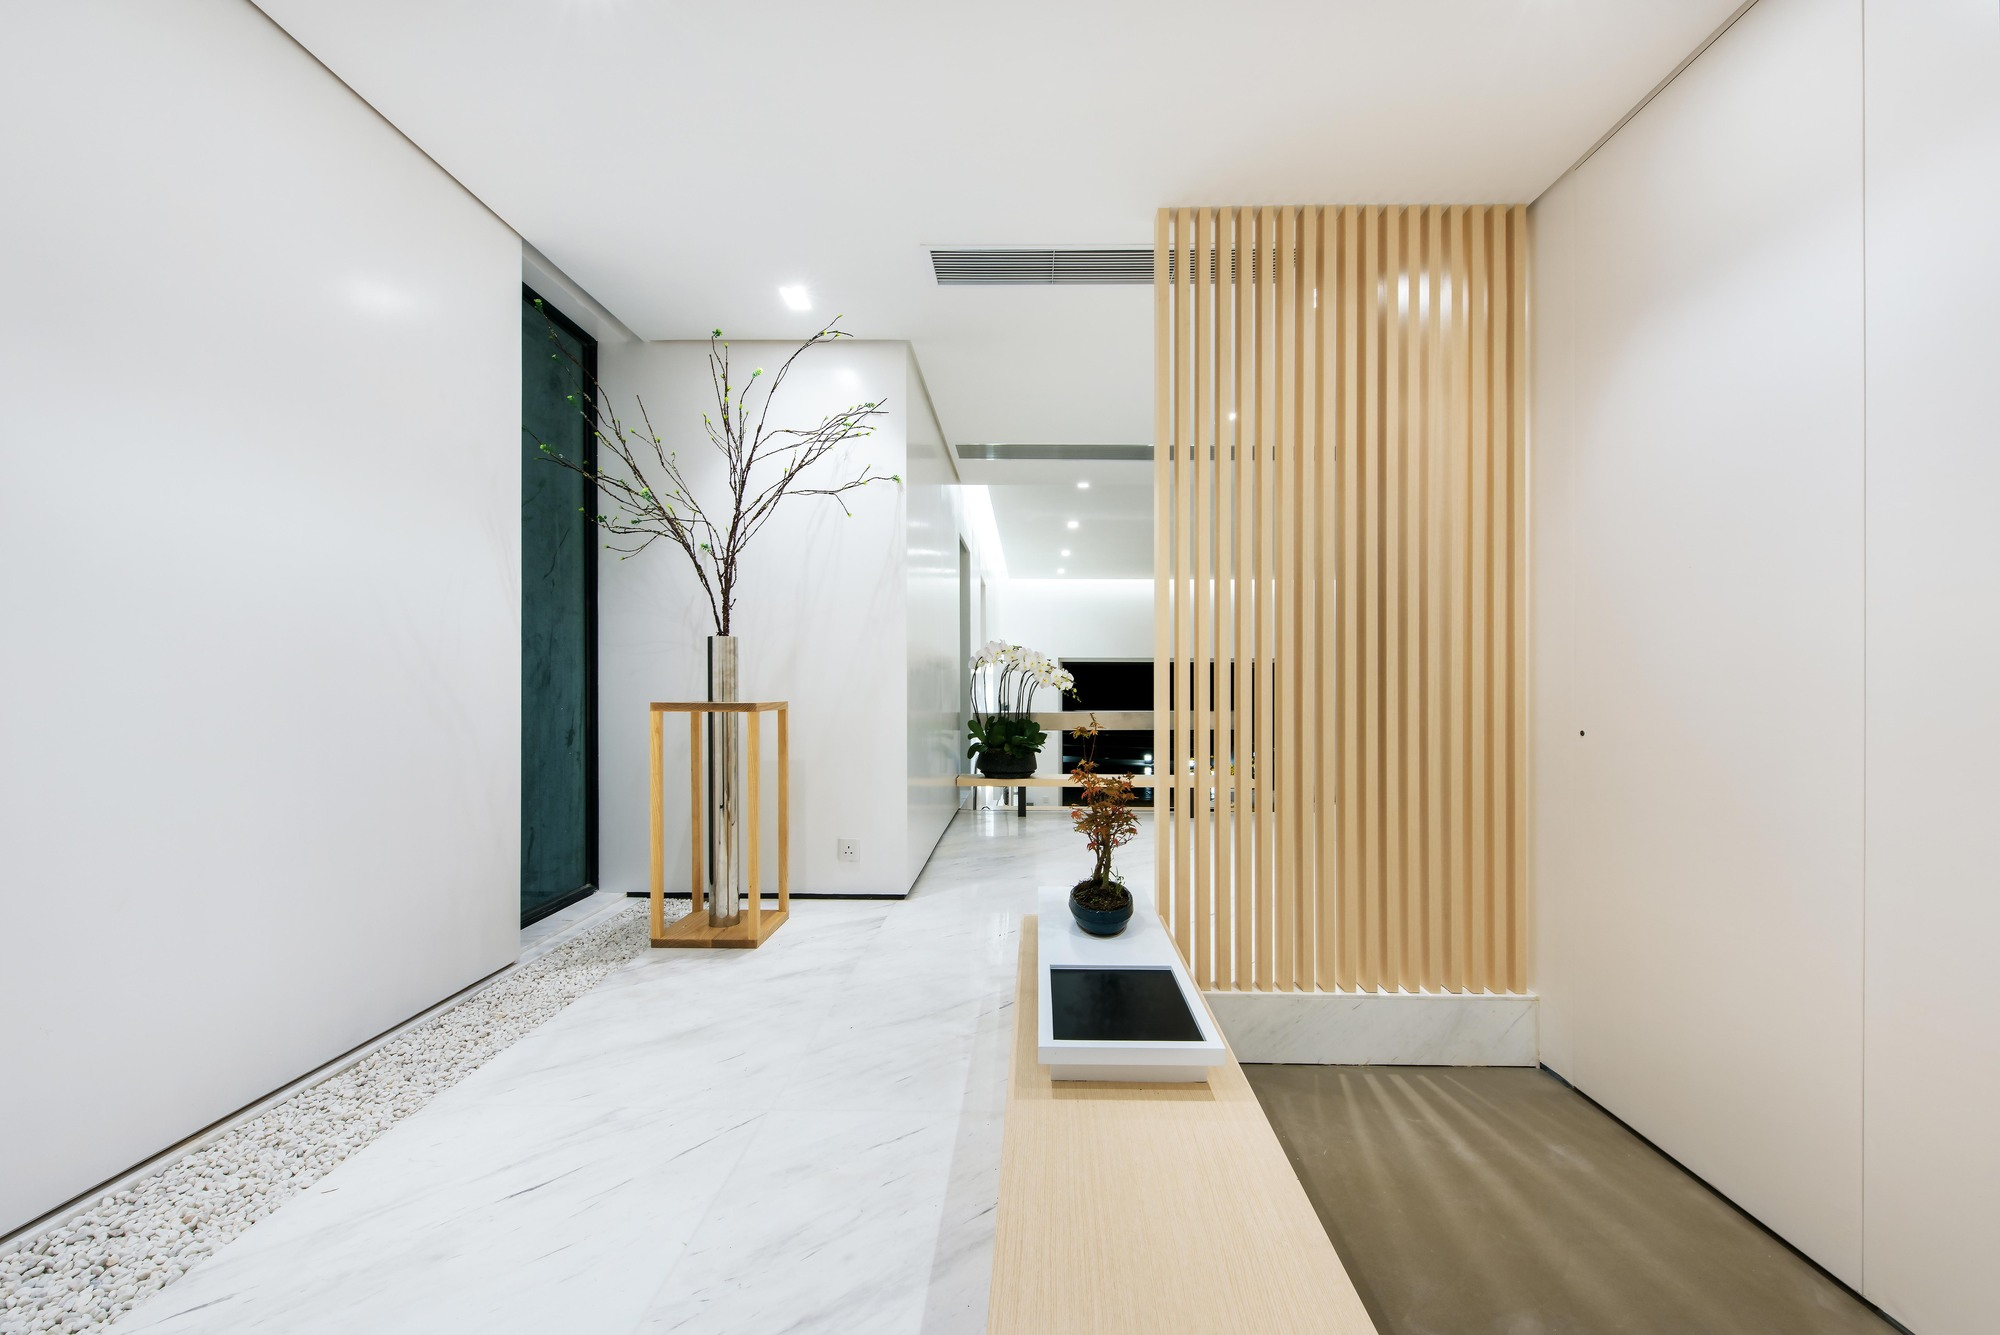 Show The Esteem Class of Your Interiors With A Professional Interior Designer